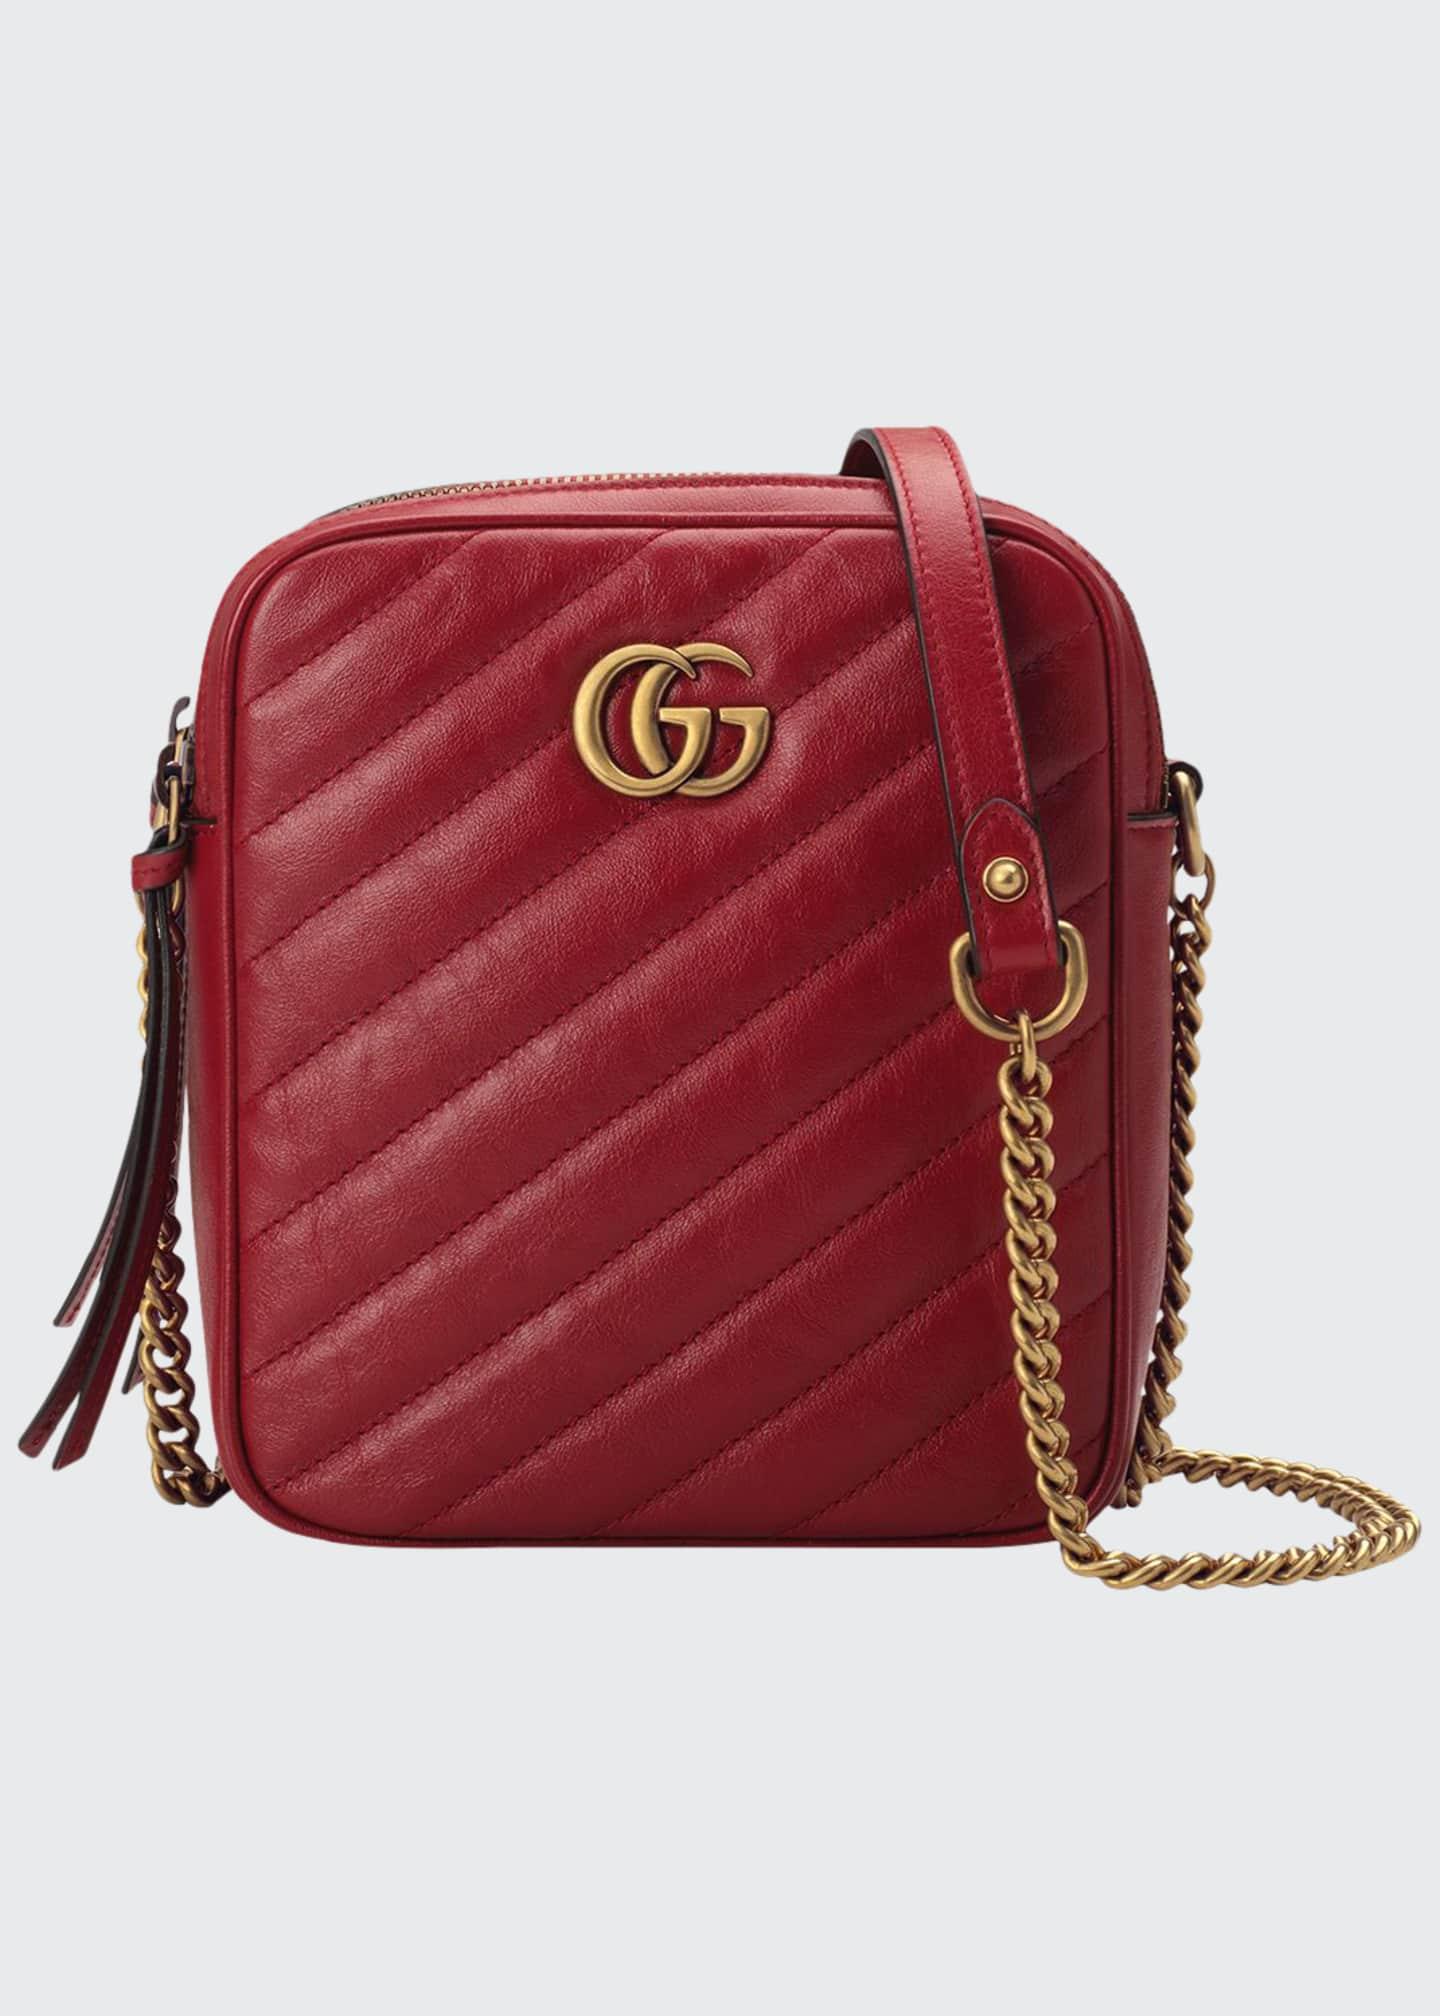 Gucci GG Marmont Tall Chevron Leather Crossbody Bag